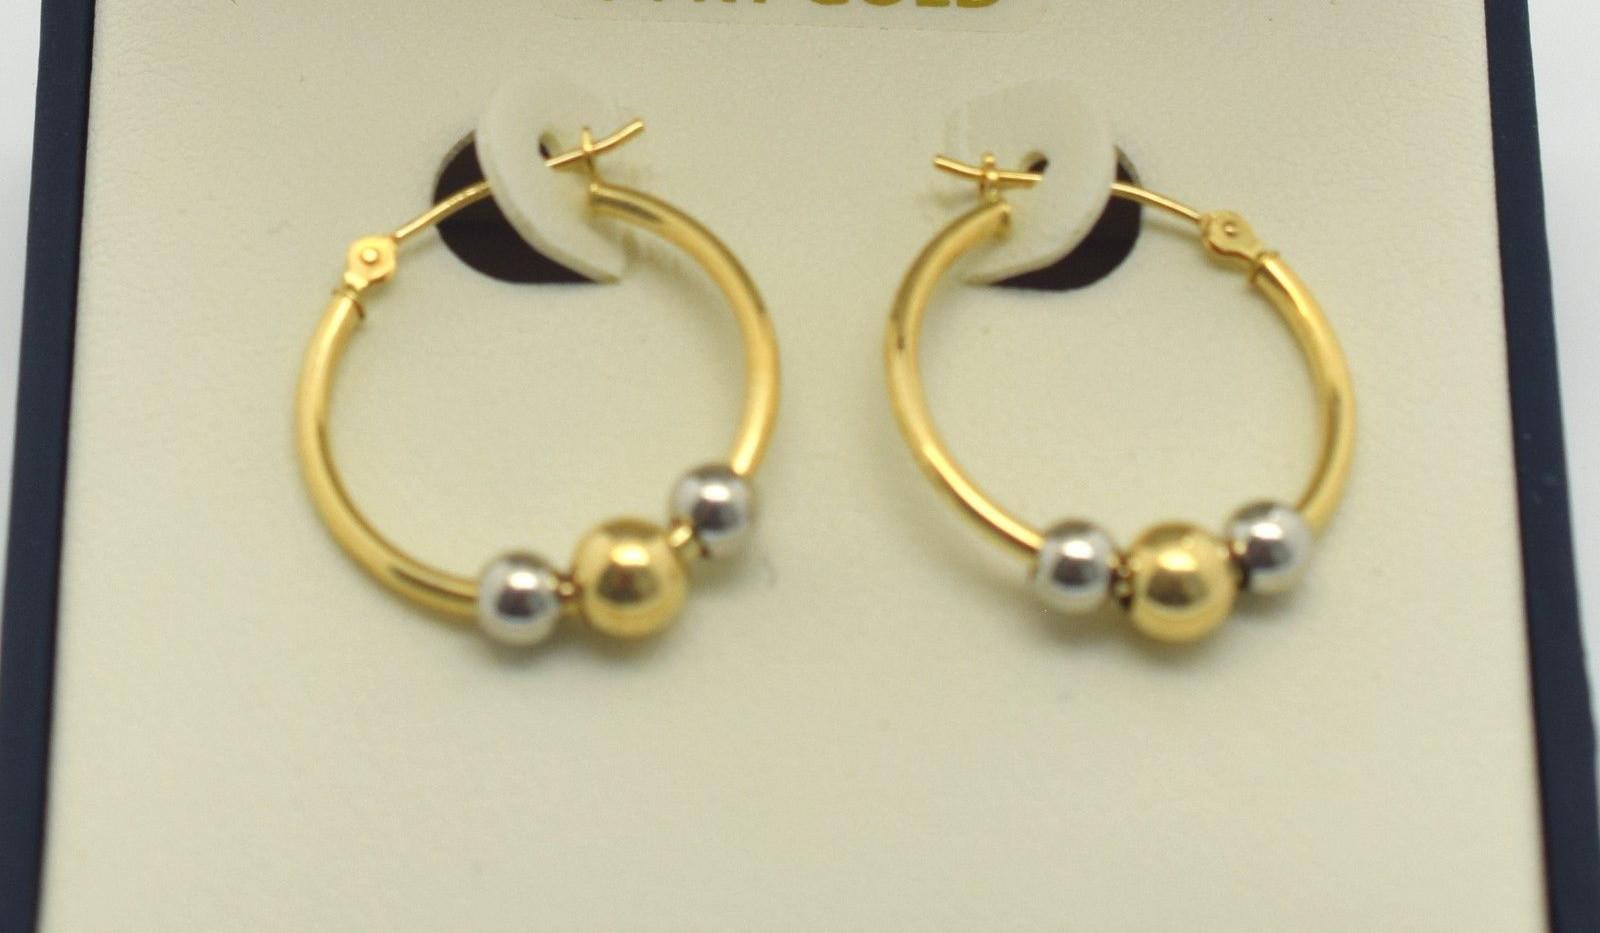 Gold Hoop Earrings 14k Yellow and White Gold 1 Gram 25 MM NR